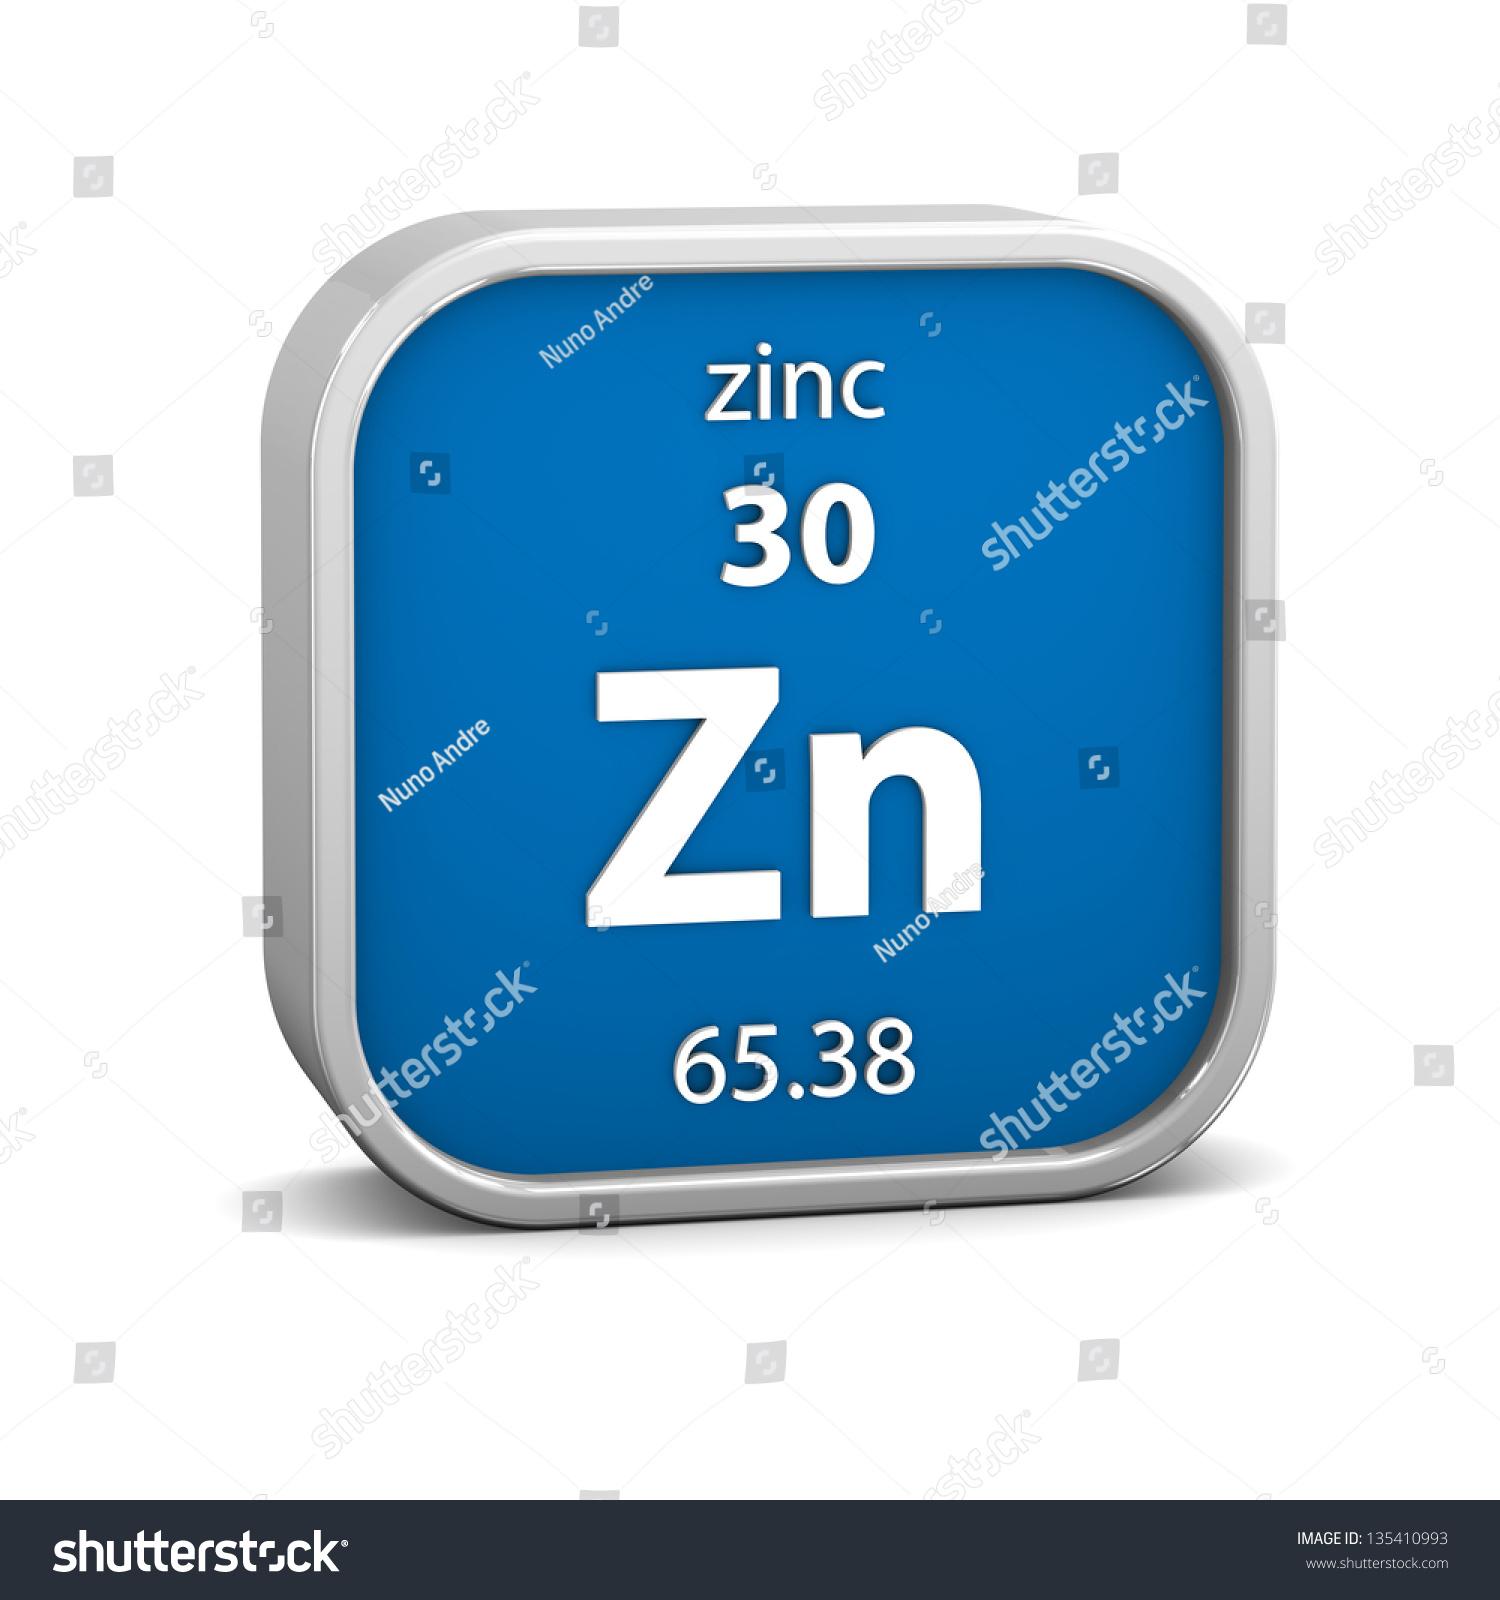 Periodic table zinc choice image periodic table images periodic table for zinc choice image periodic table images zinc material on periodic table part stock gamestrikefo Gallery